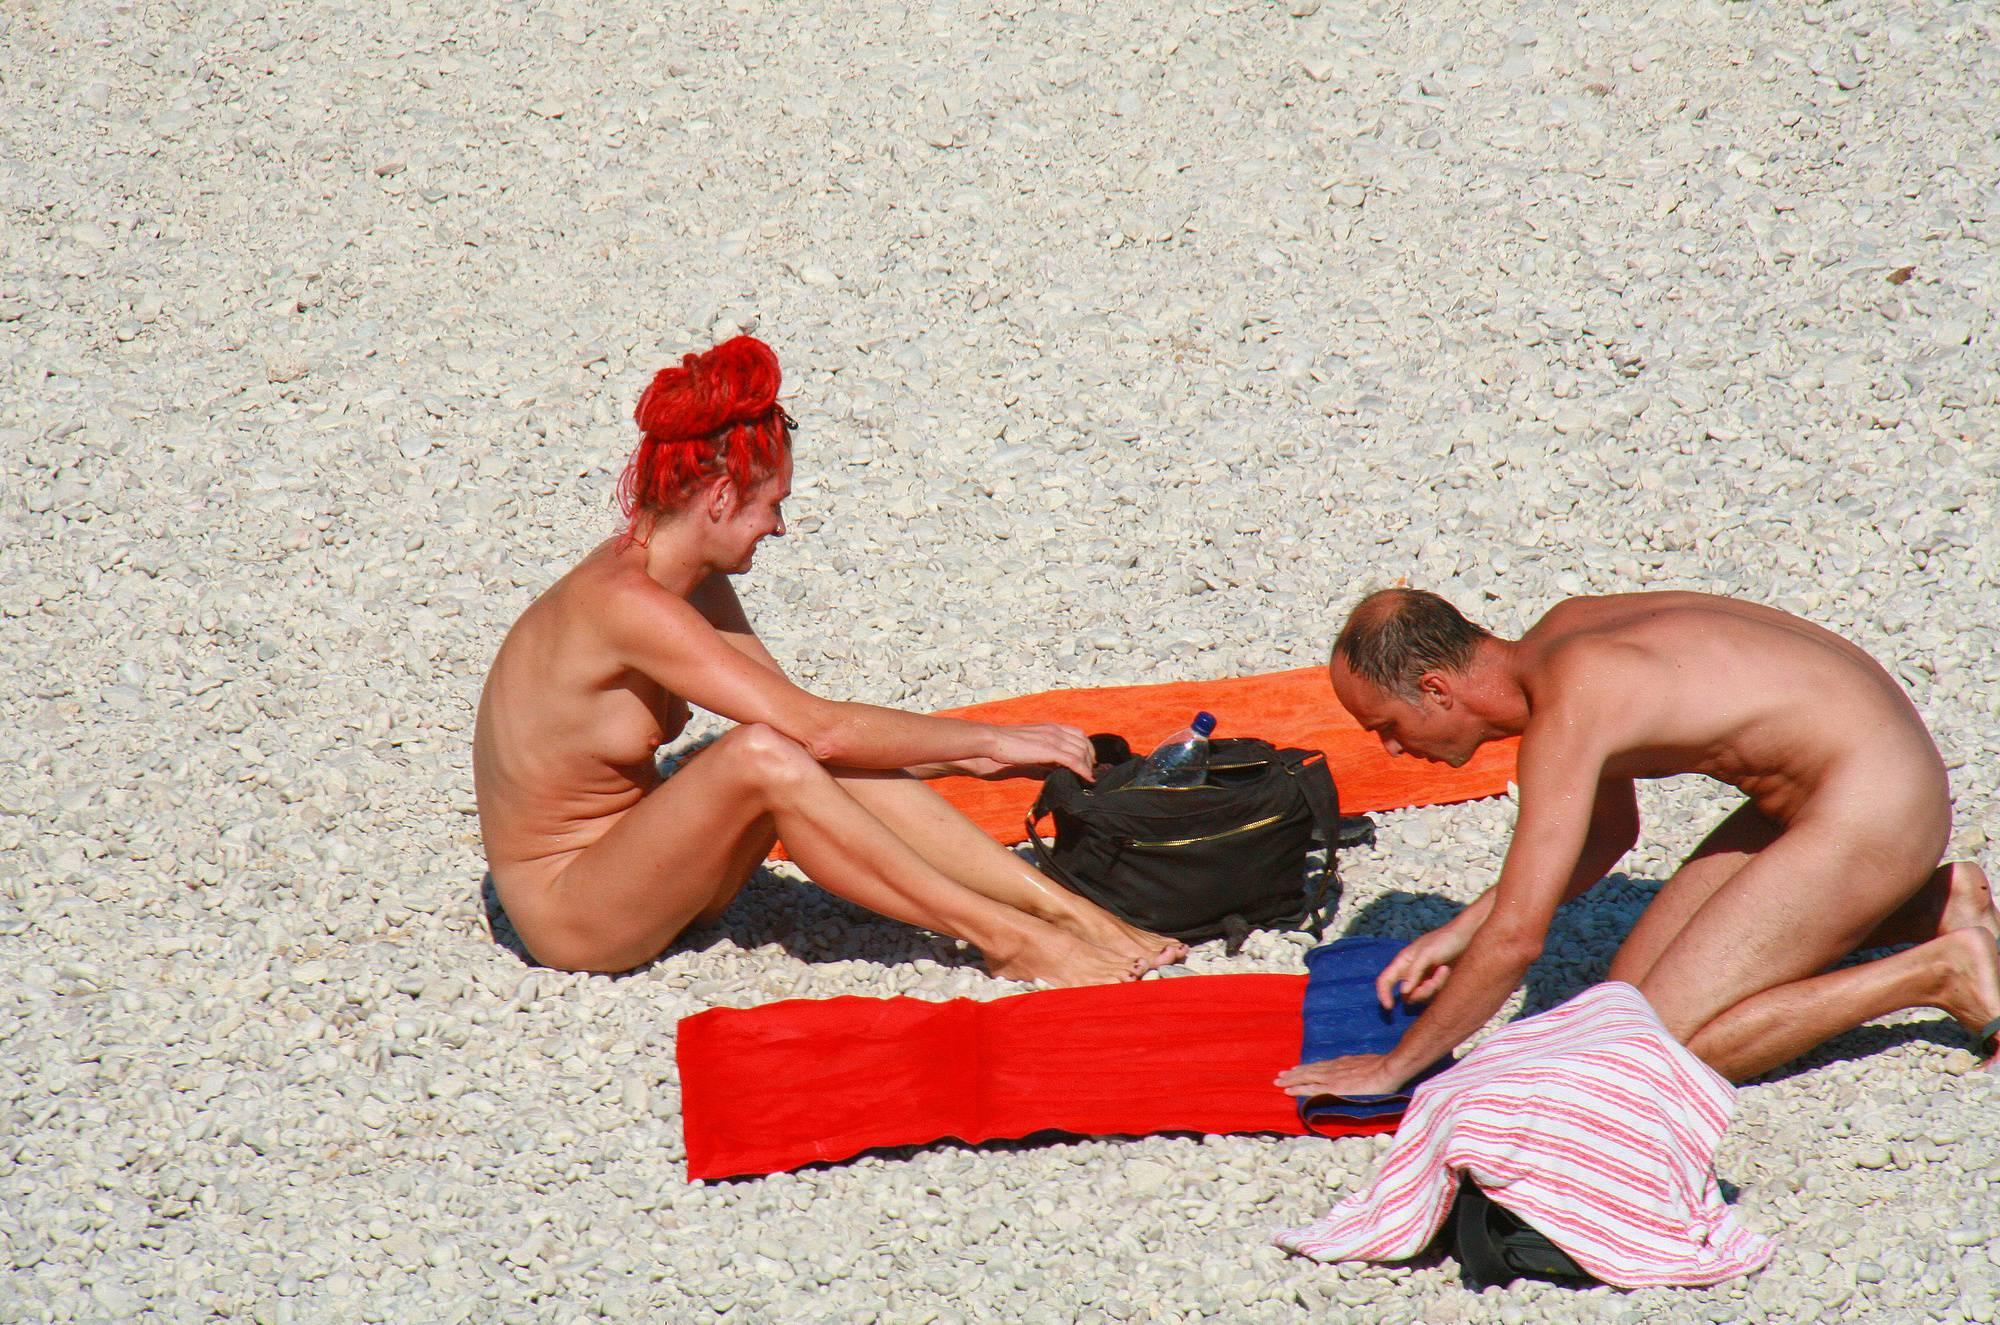 Nudist Photos Ula FKK Red Hairstyle Girl - 2